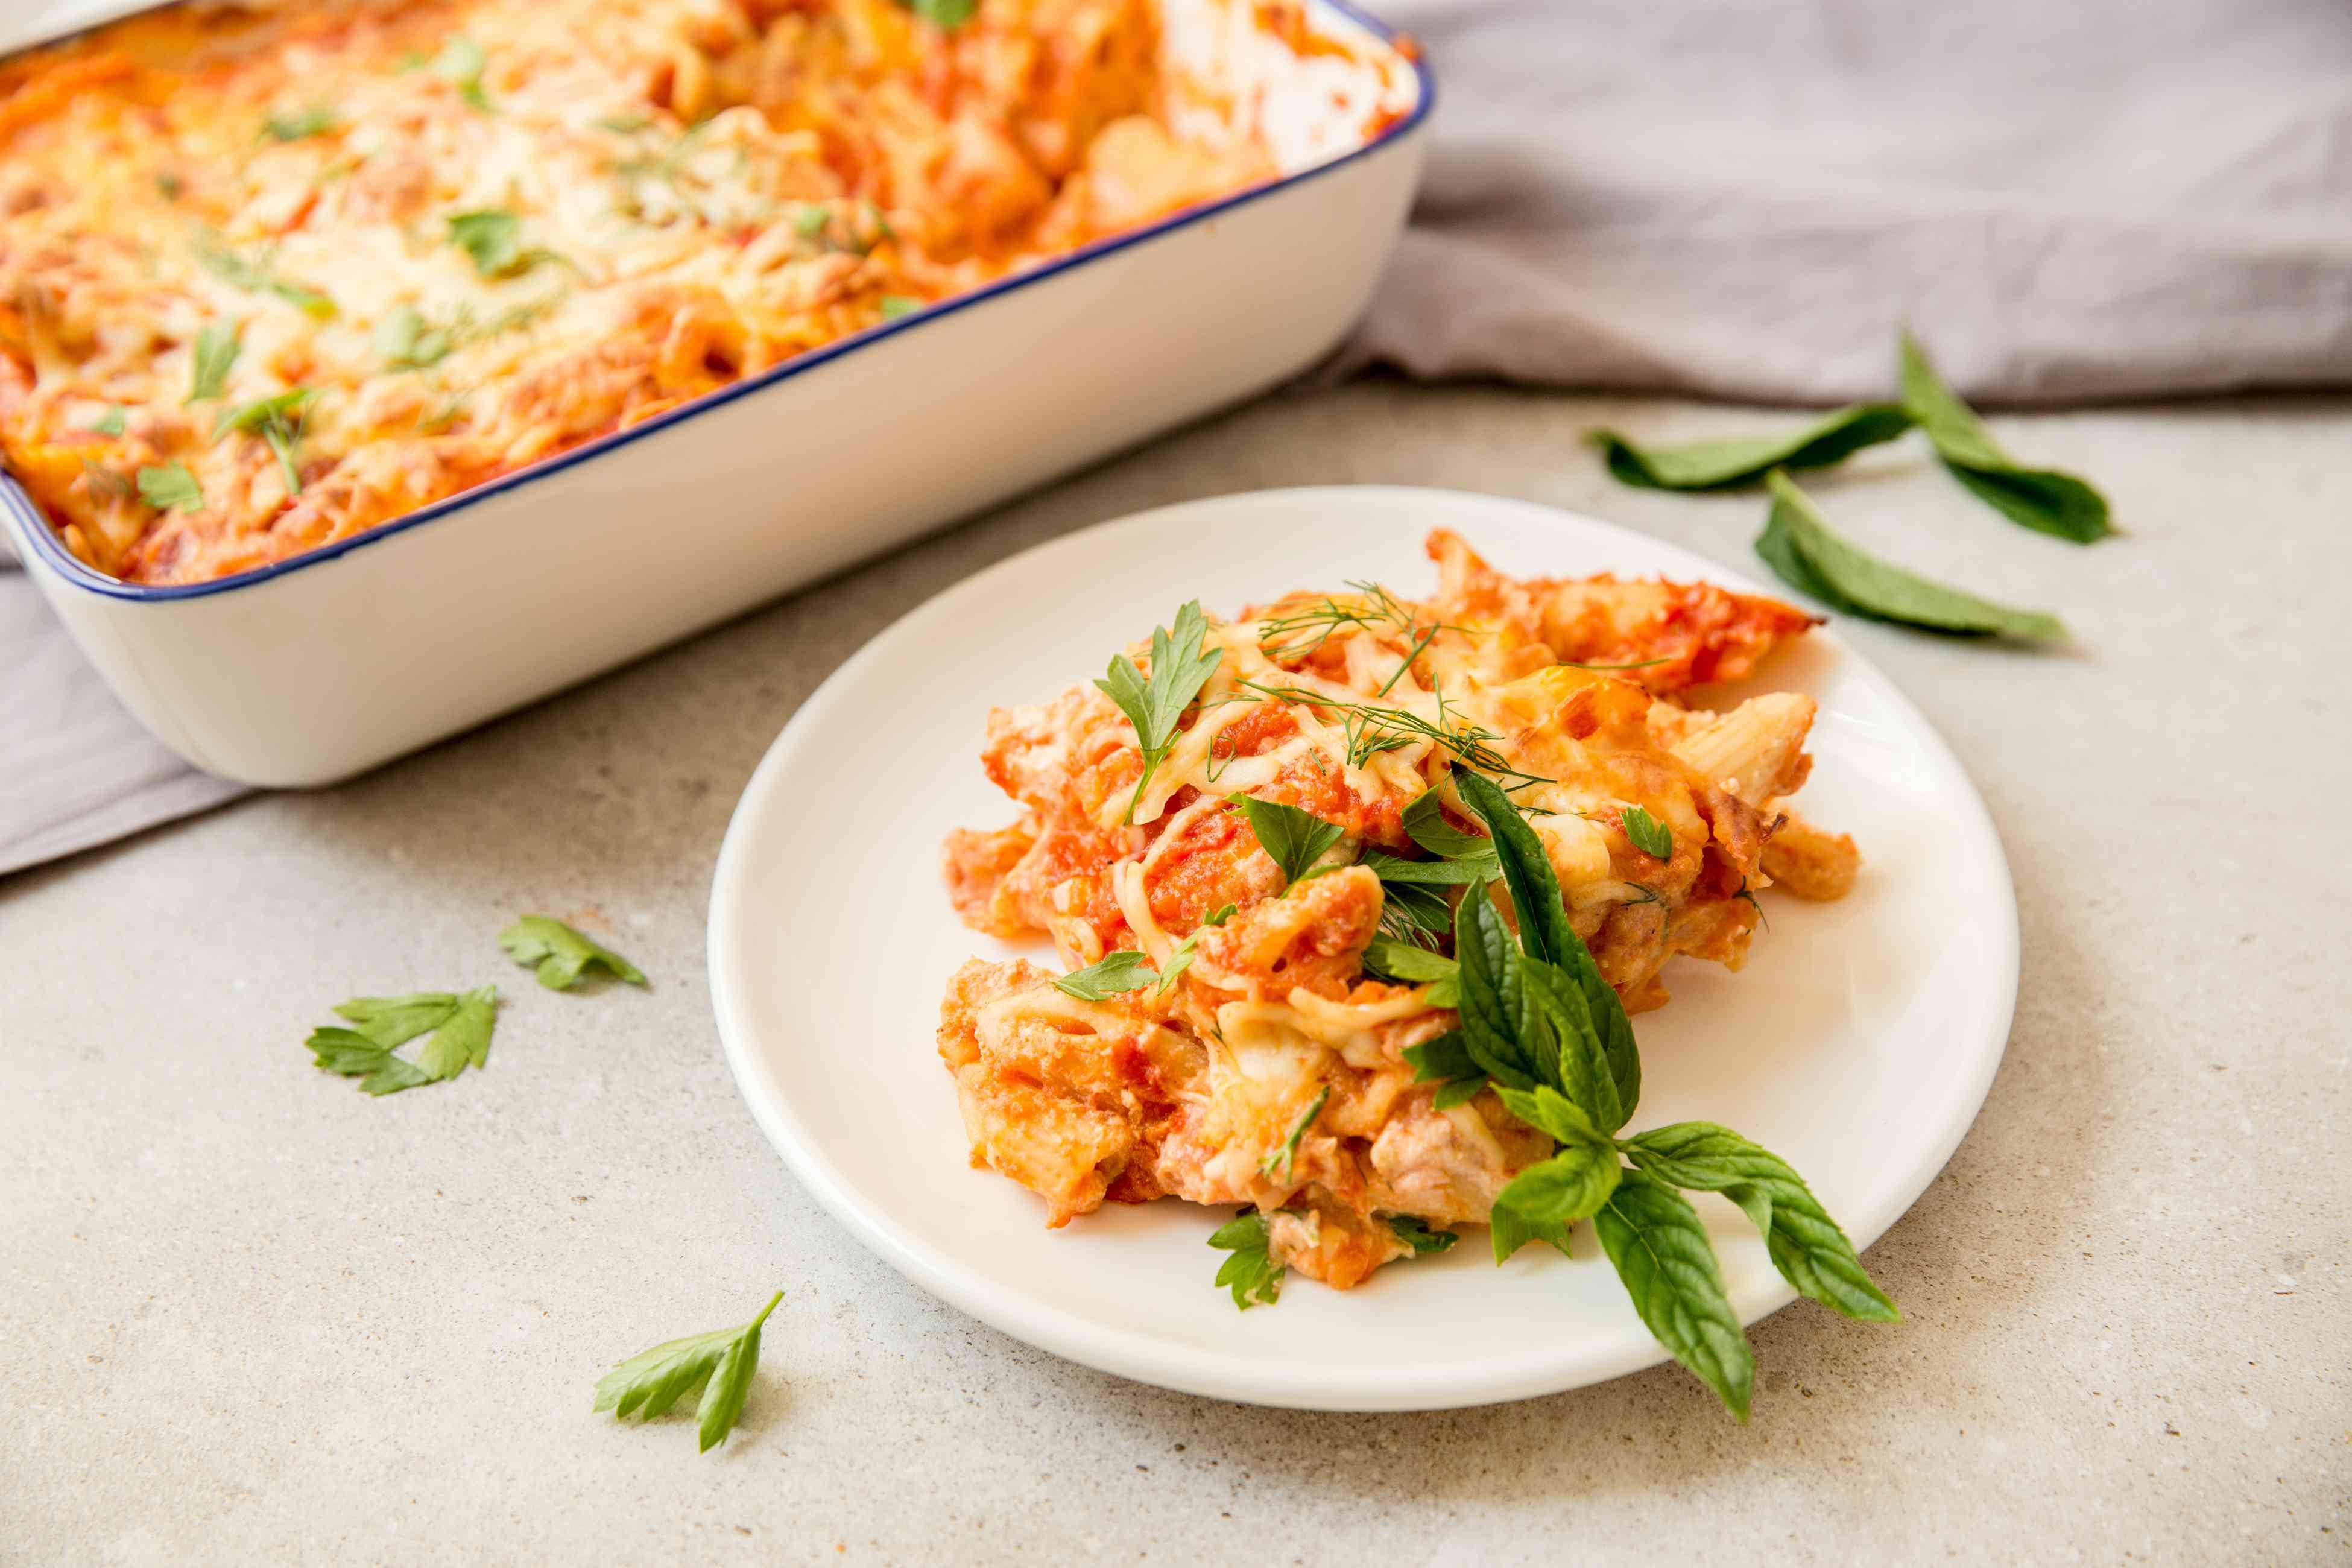 Basic oven baked pasta recipe